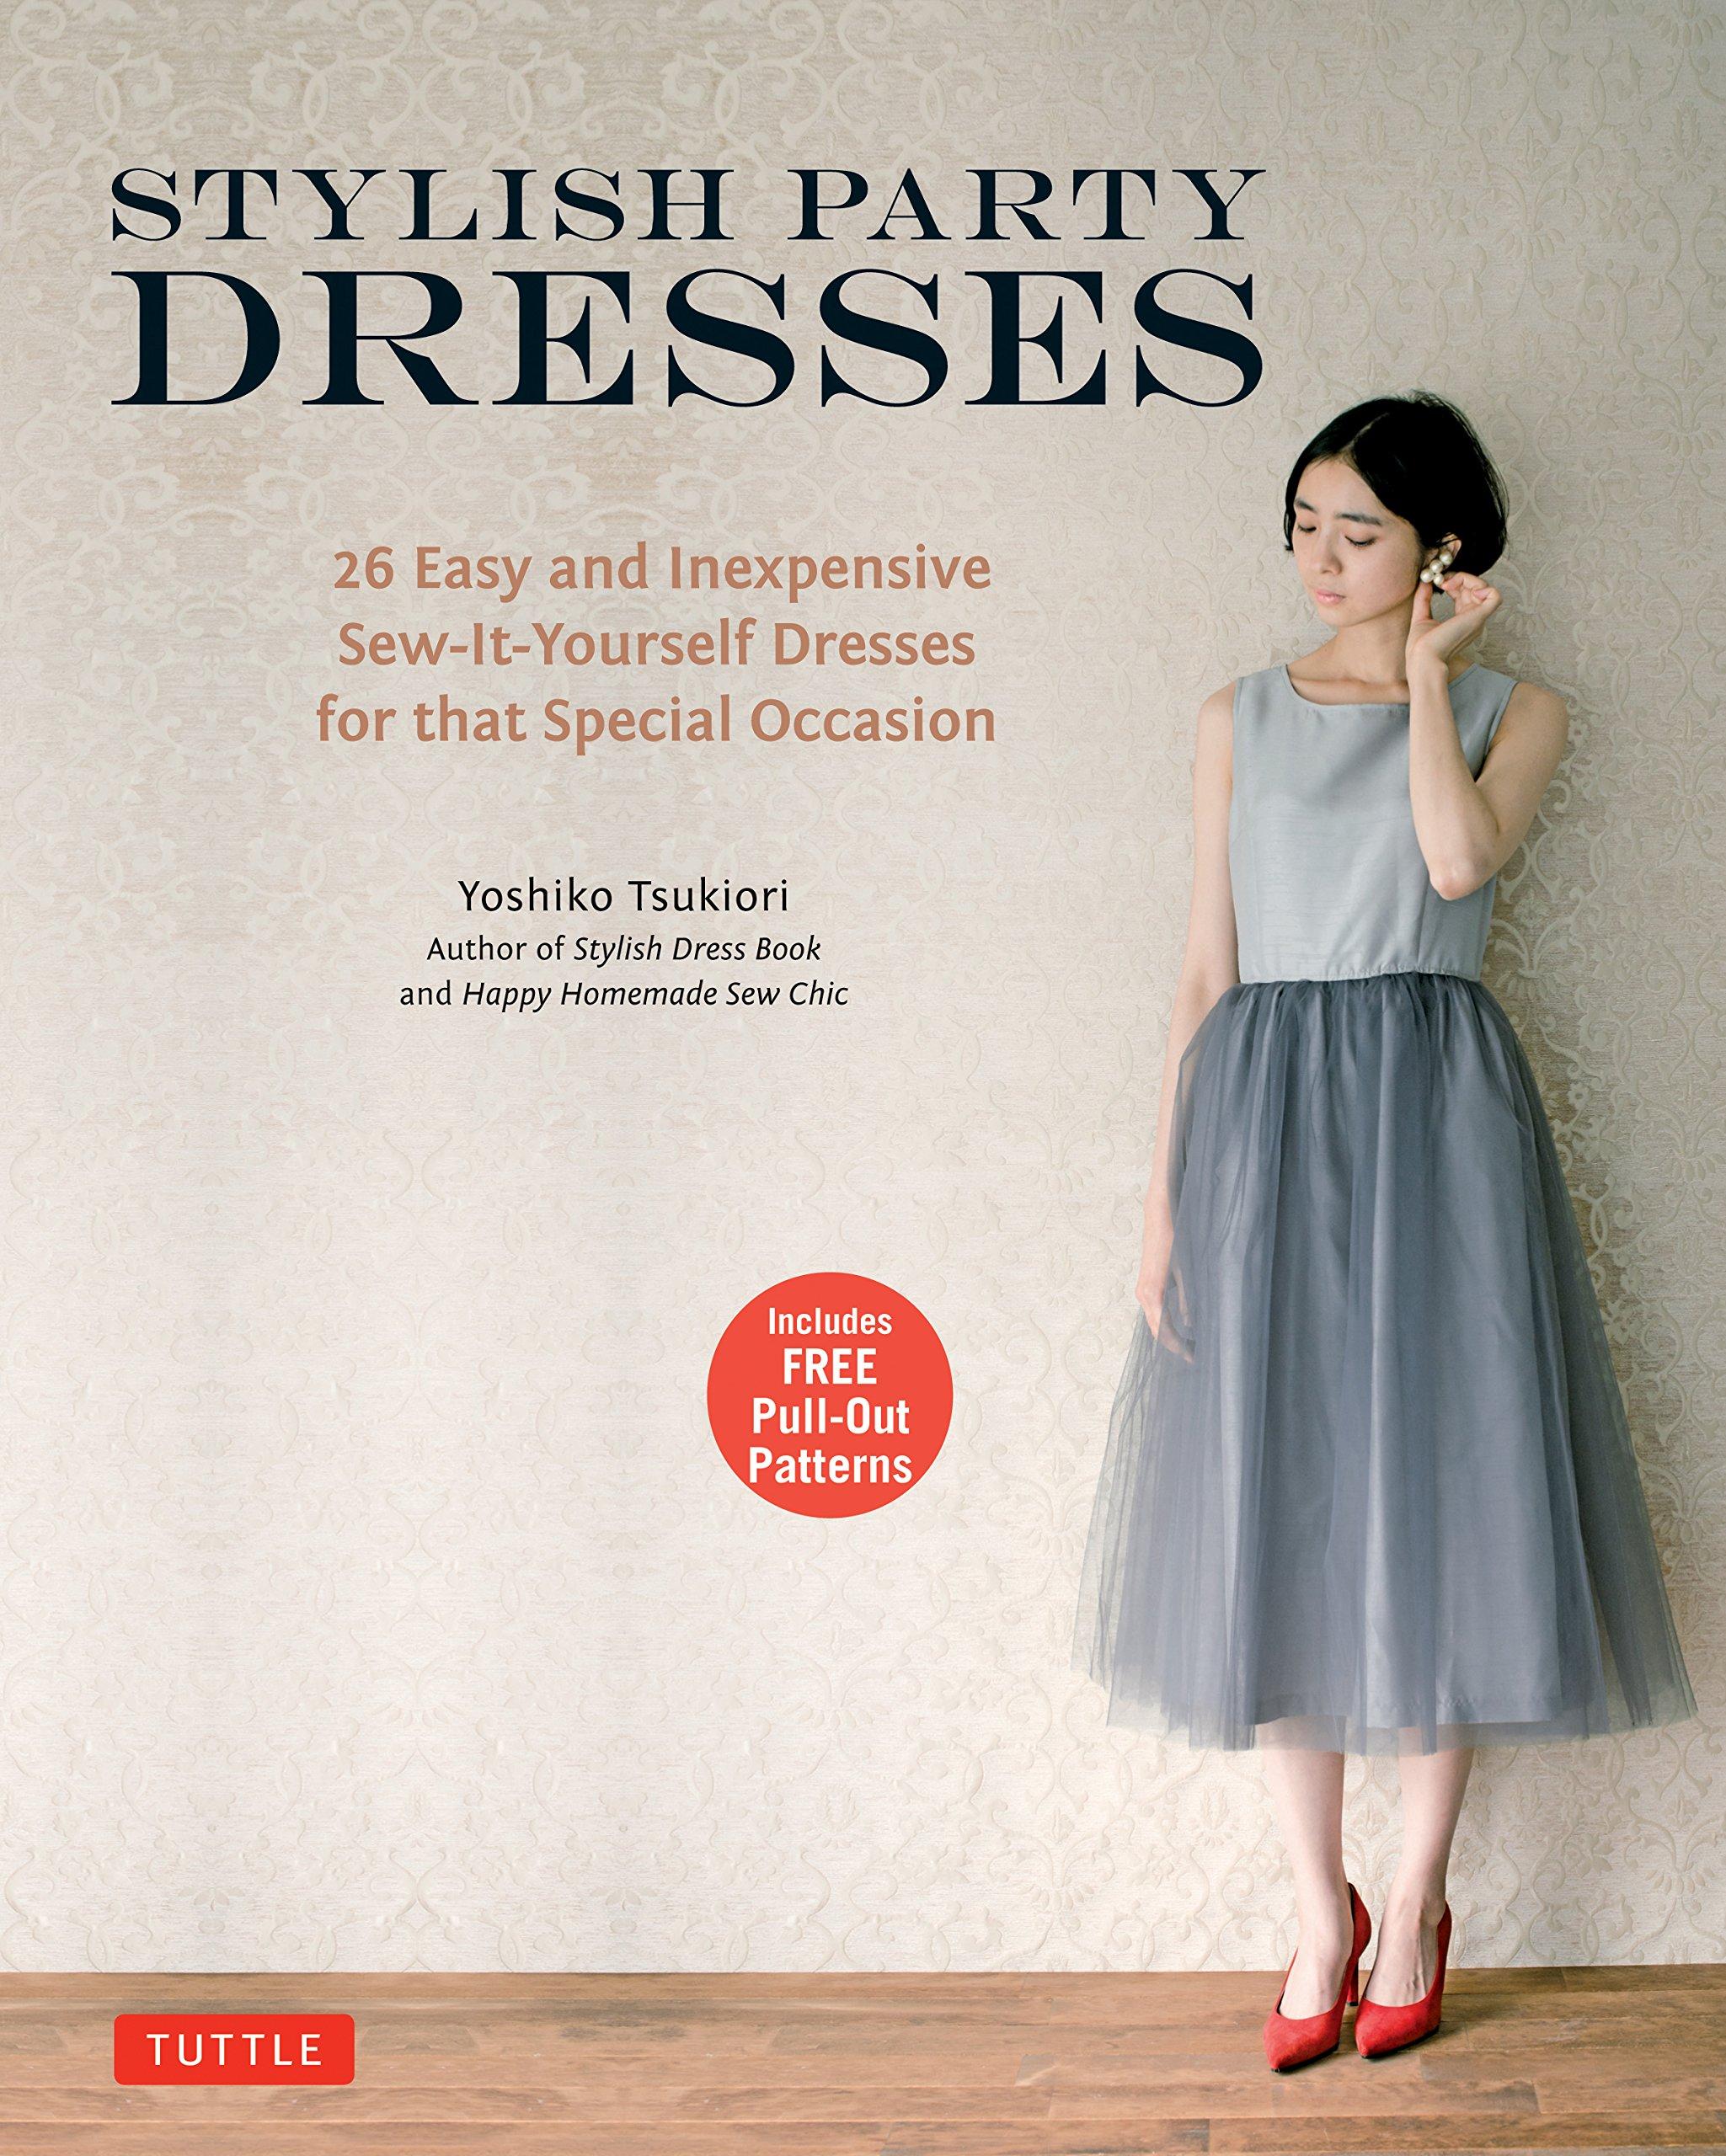 Stylish Party Dresses by Tsukiori Yoshiko